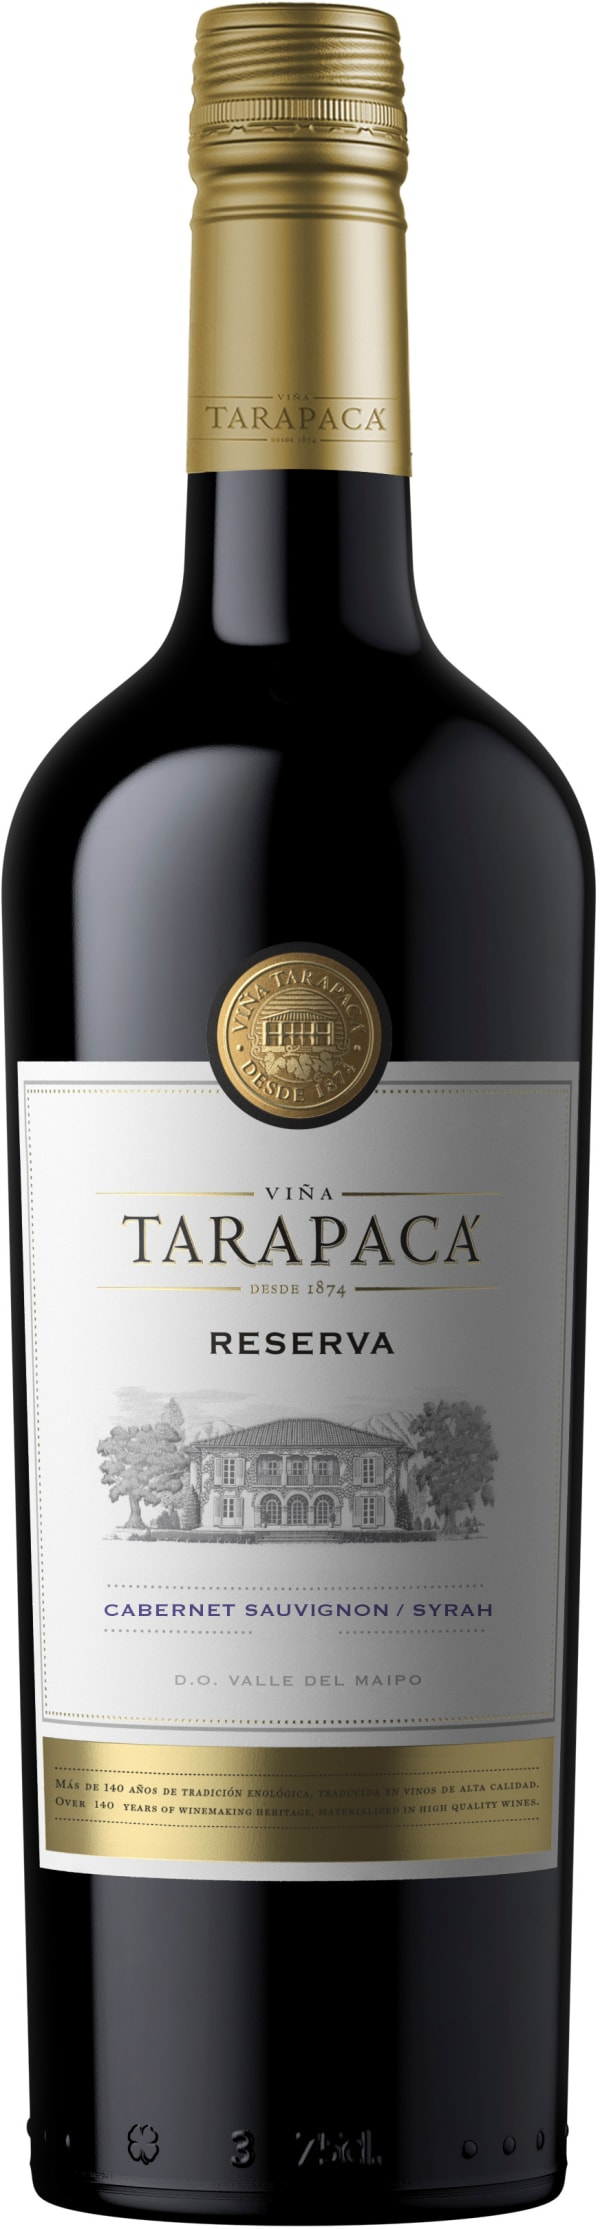 Tarapacá Reserva Cabernet Sauvignon Syrah 2019